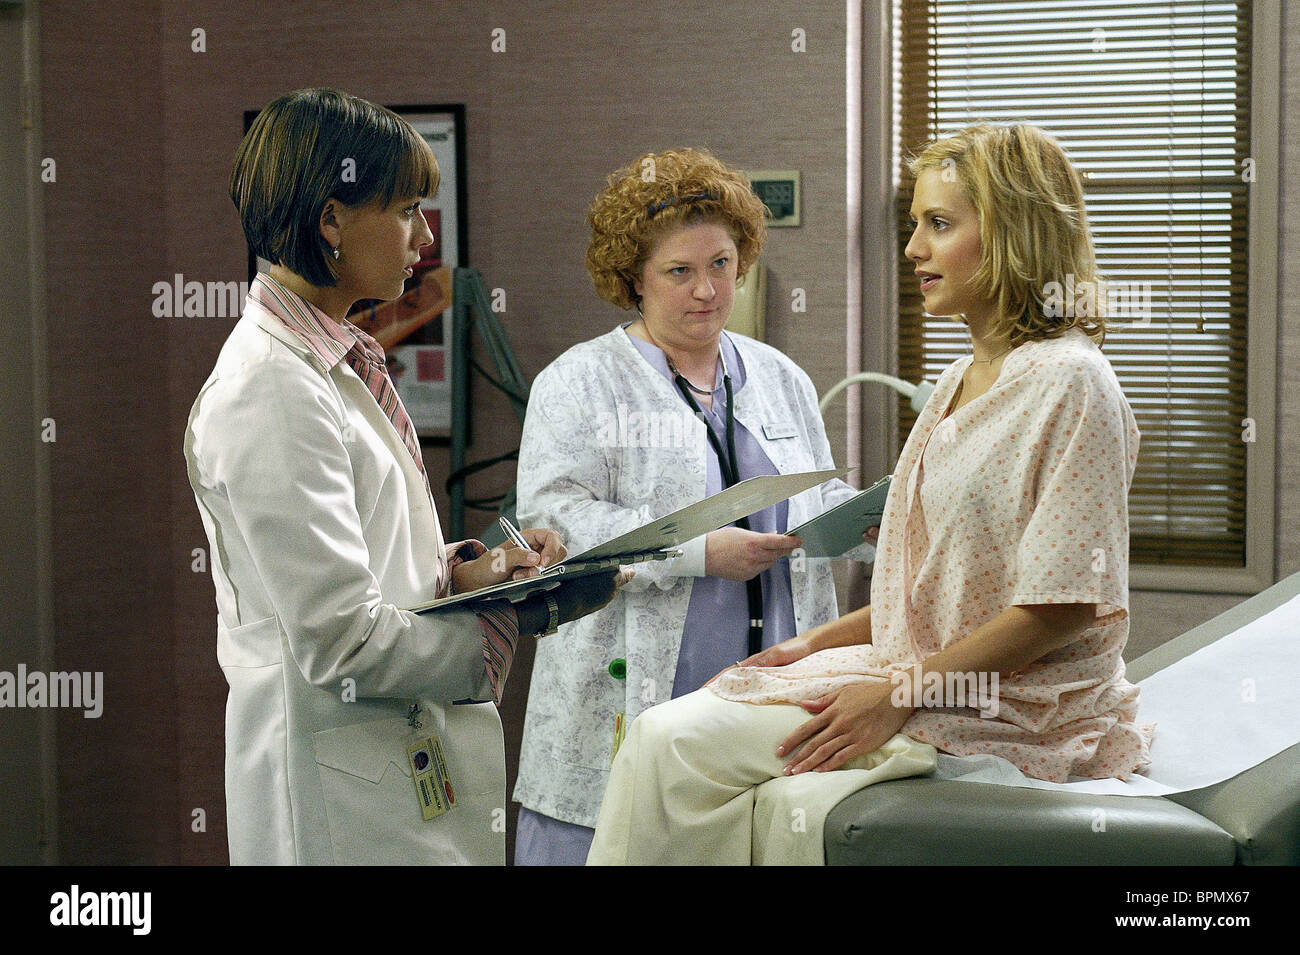 Brittany Murphy Hospital